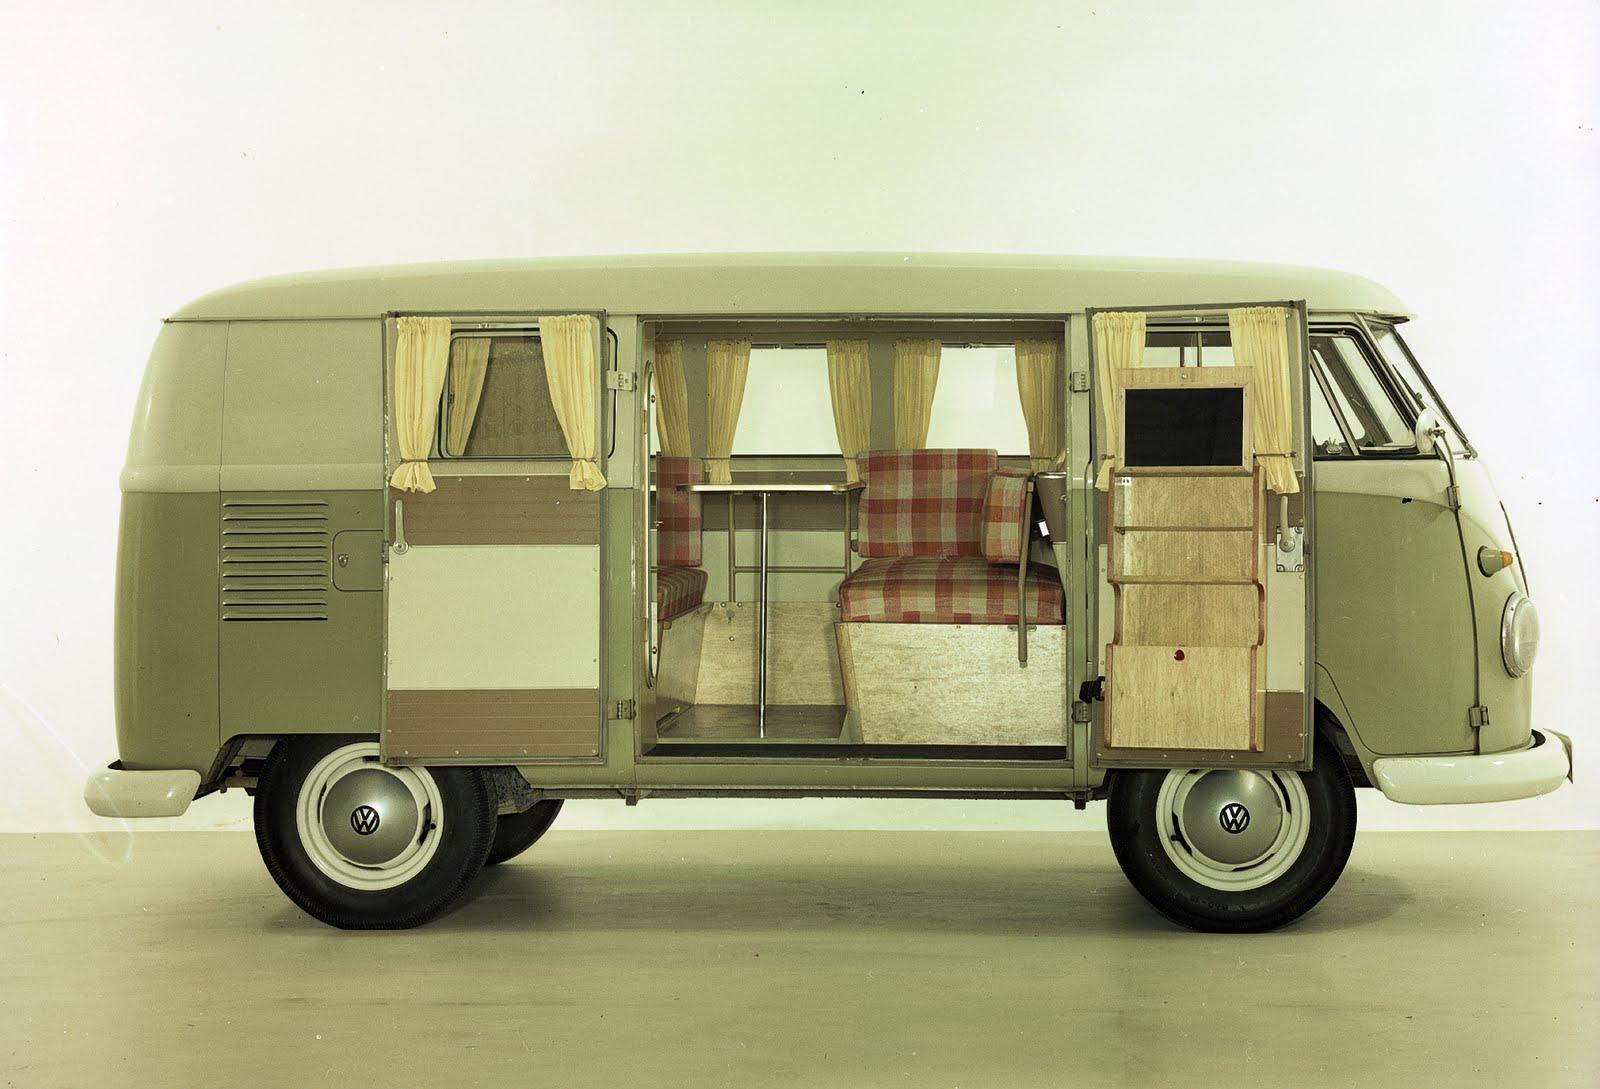 Volkswagen transporter t2 t3 t4 auto epoca anni 70 for Furgone anni 70 volkswagen